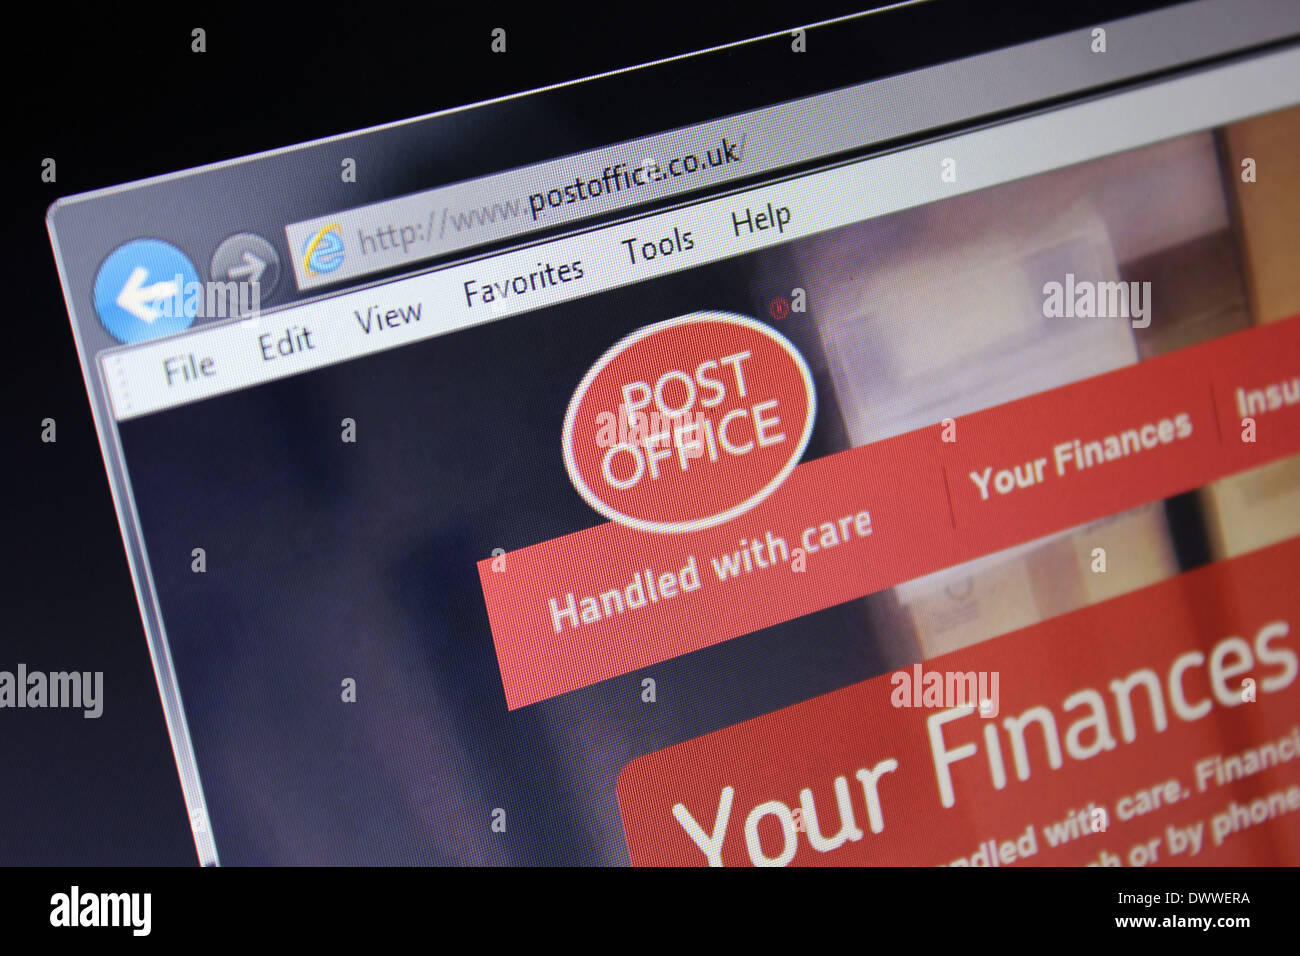 postoffice website - Stock Image